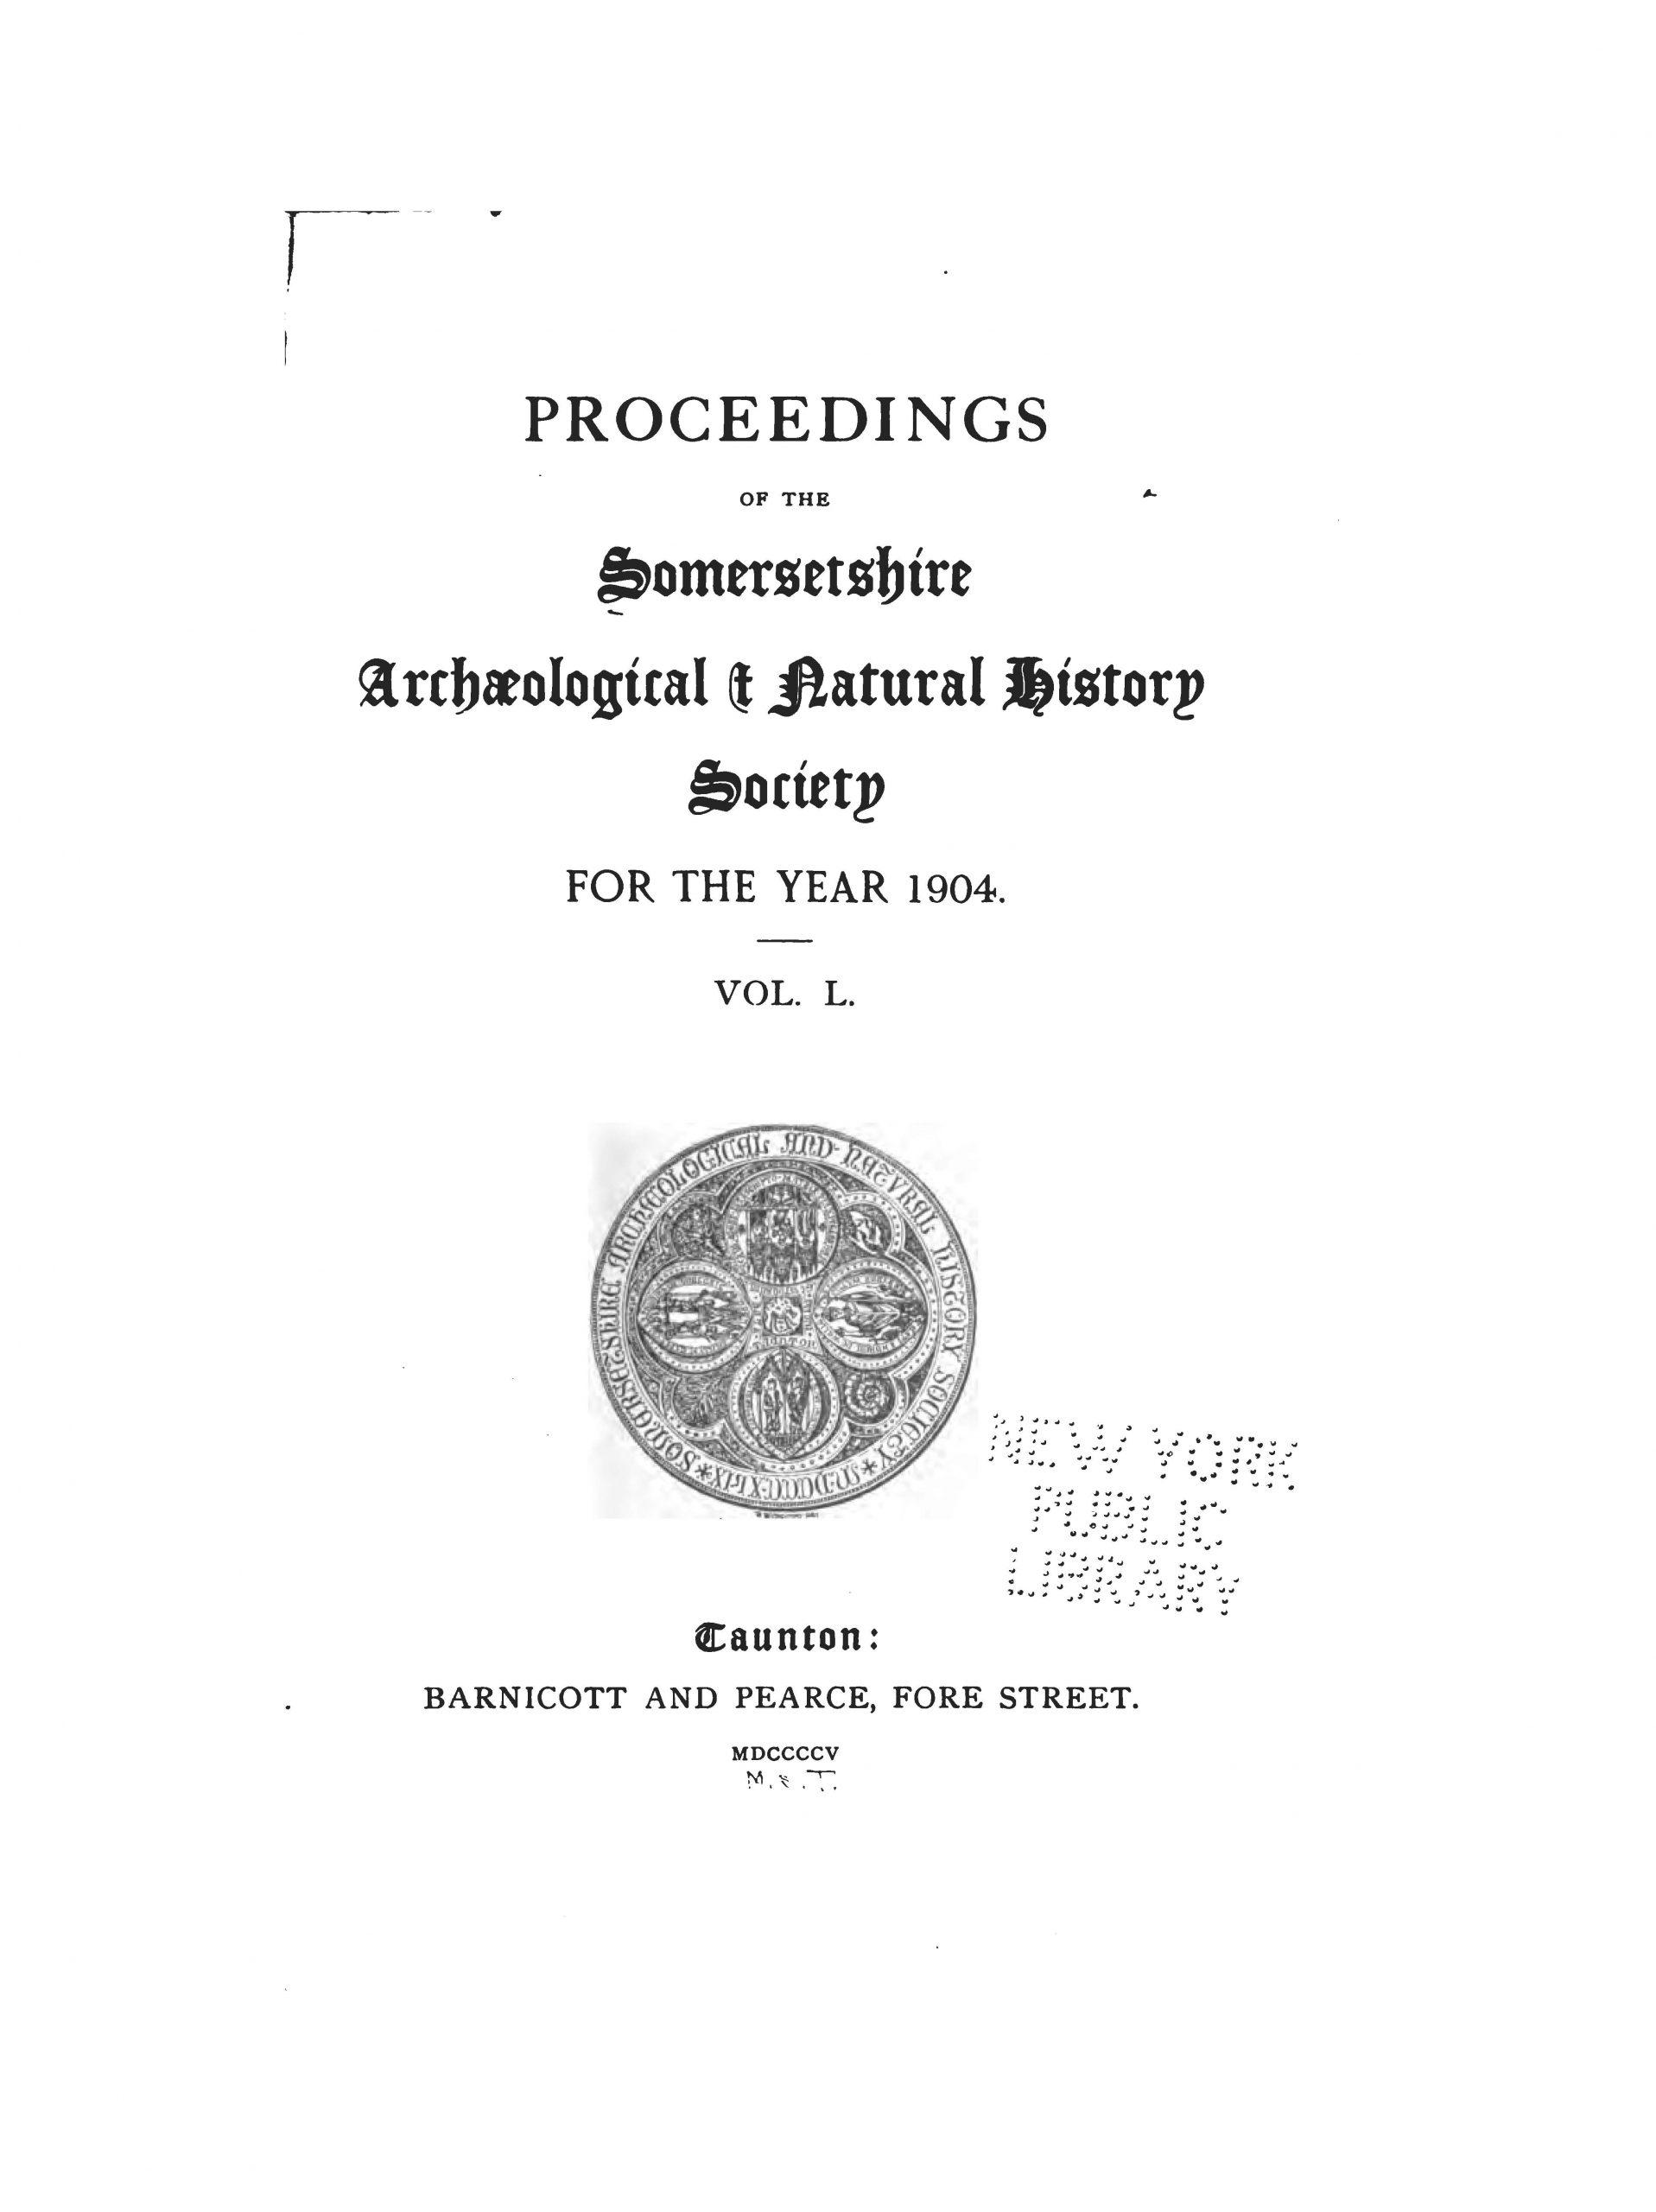 SANHS Proceedings Volume 50 cover